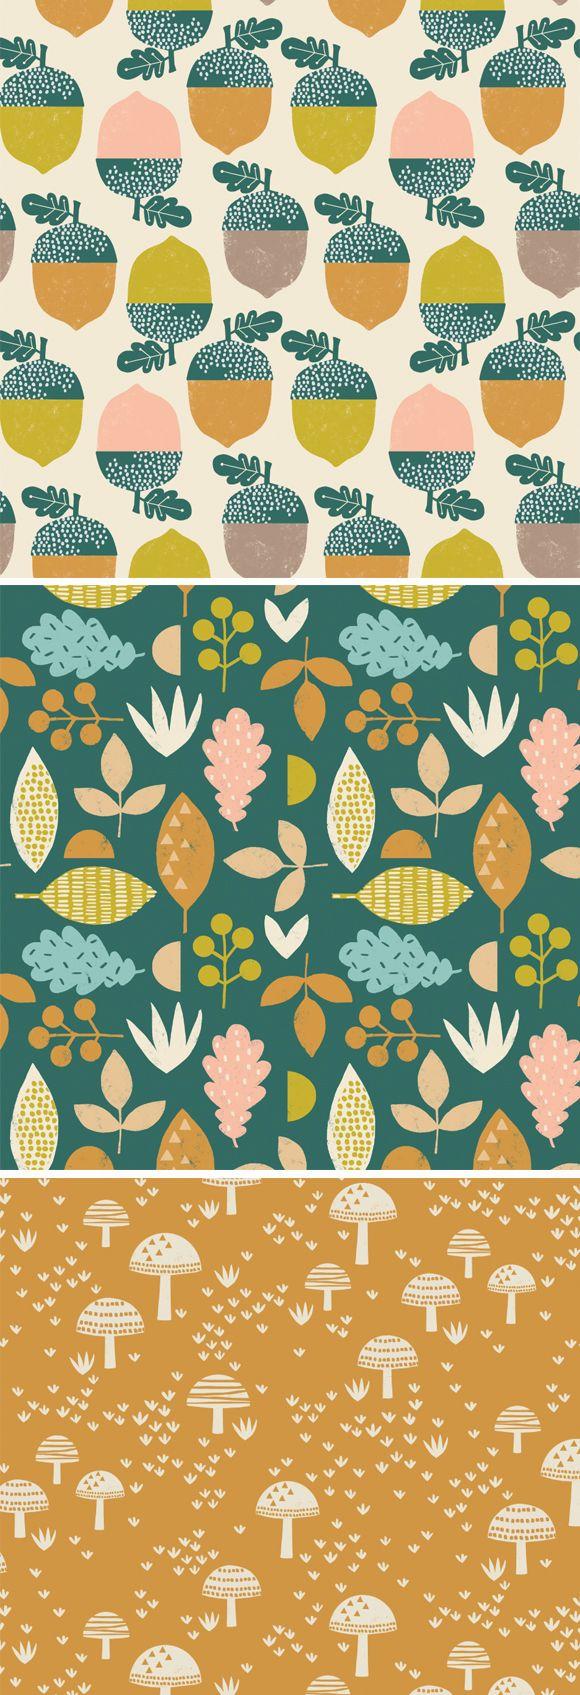 wendy kendall designs – freelance surface pattern designer » harvestwood